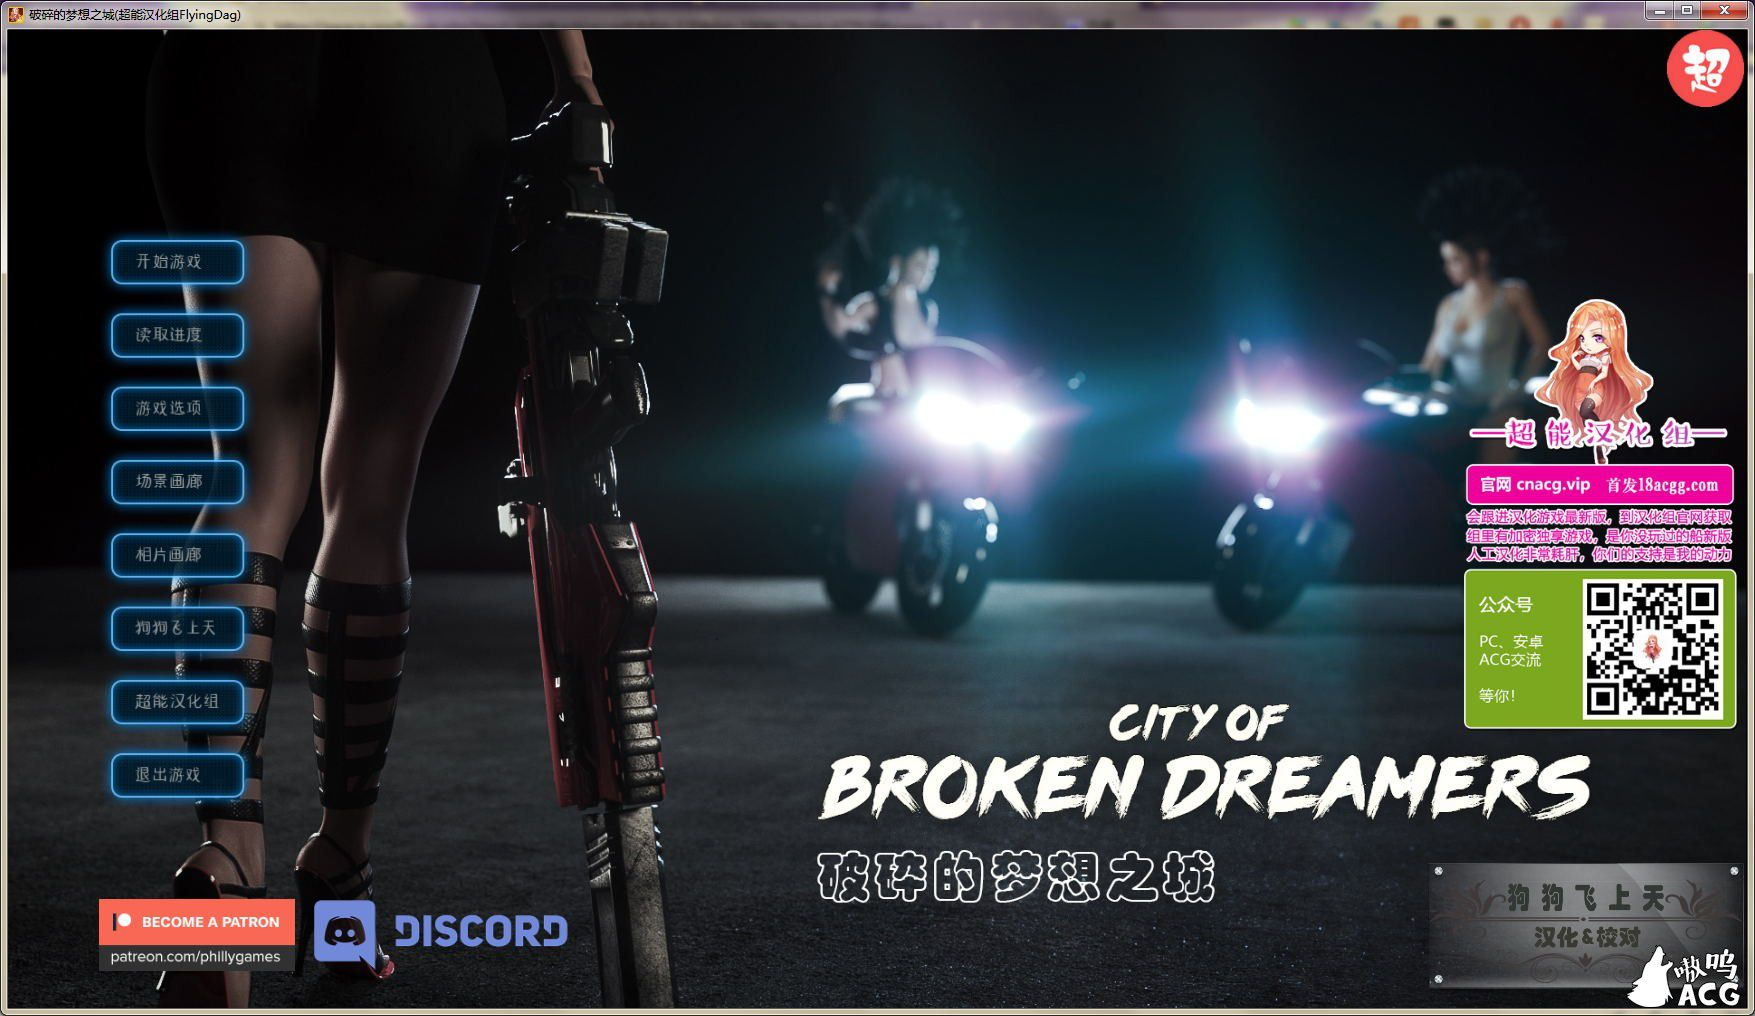 破裂的胡想之城 City of Broken Dreamers Ver0.22【更新/PC+安卓/SLG/2.5G/0412】